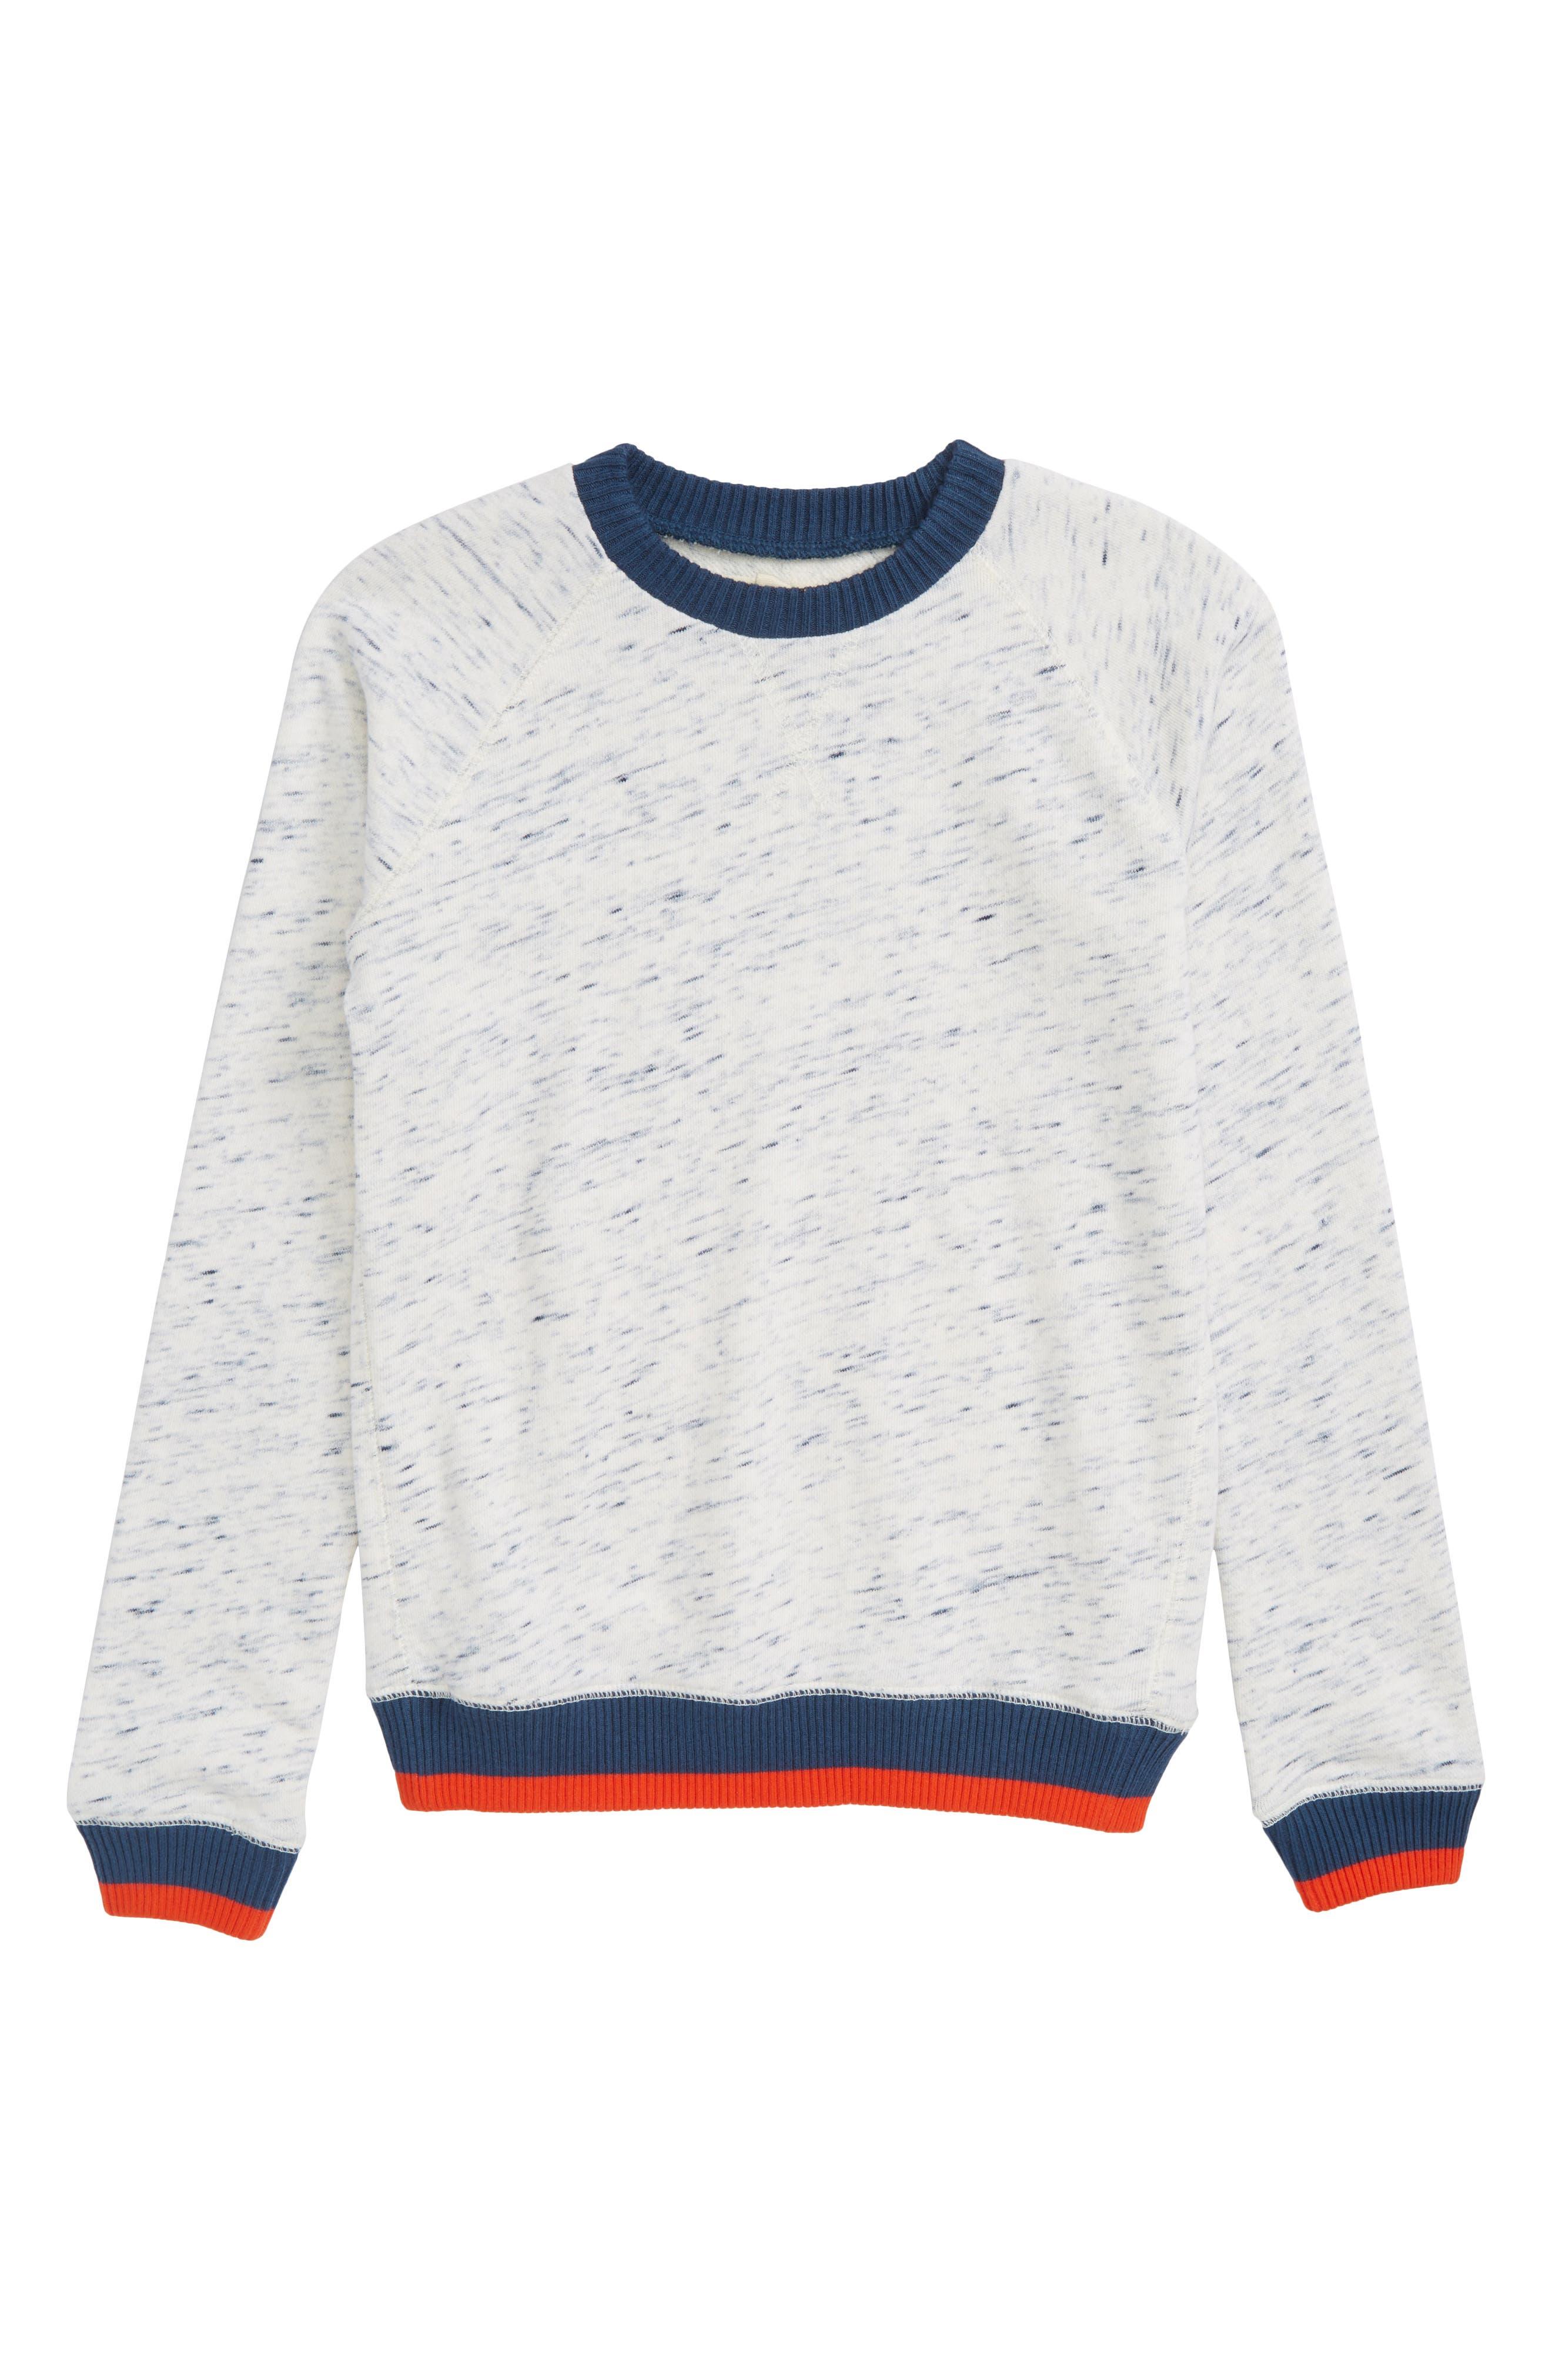 Main Image - Tucker + Tate Stripe Raglan Sweater (Toddler Boys & Little Boys)